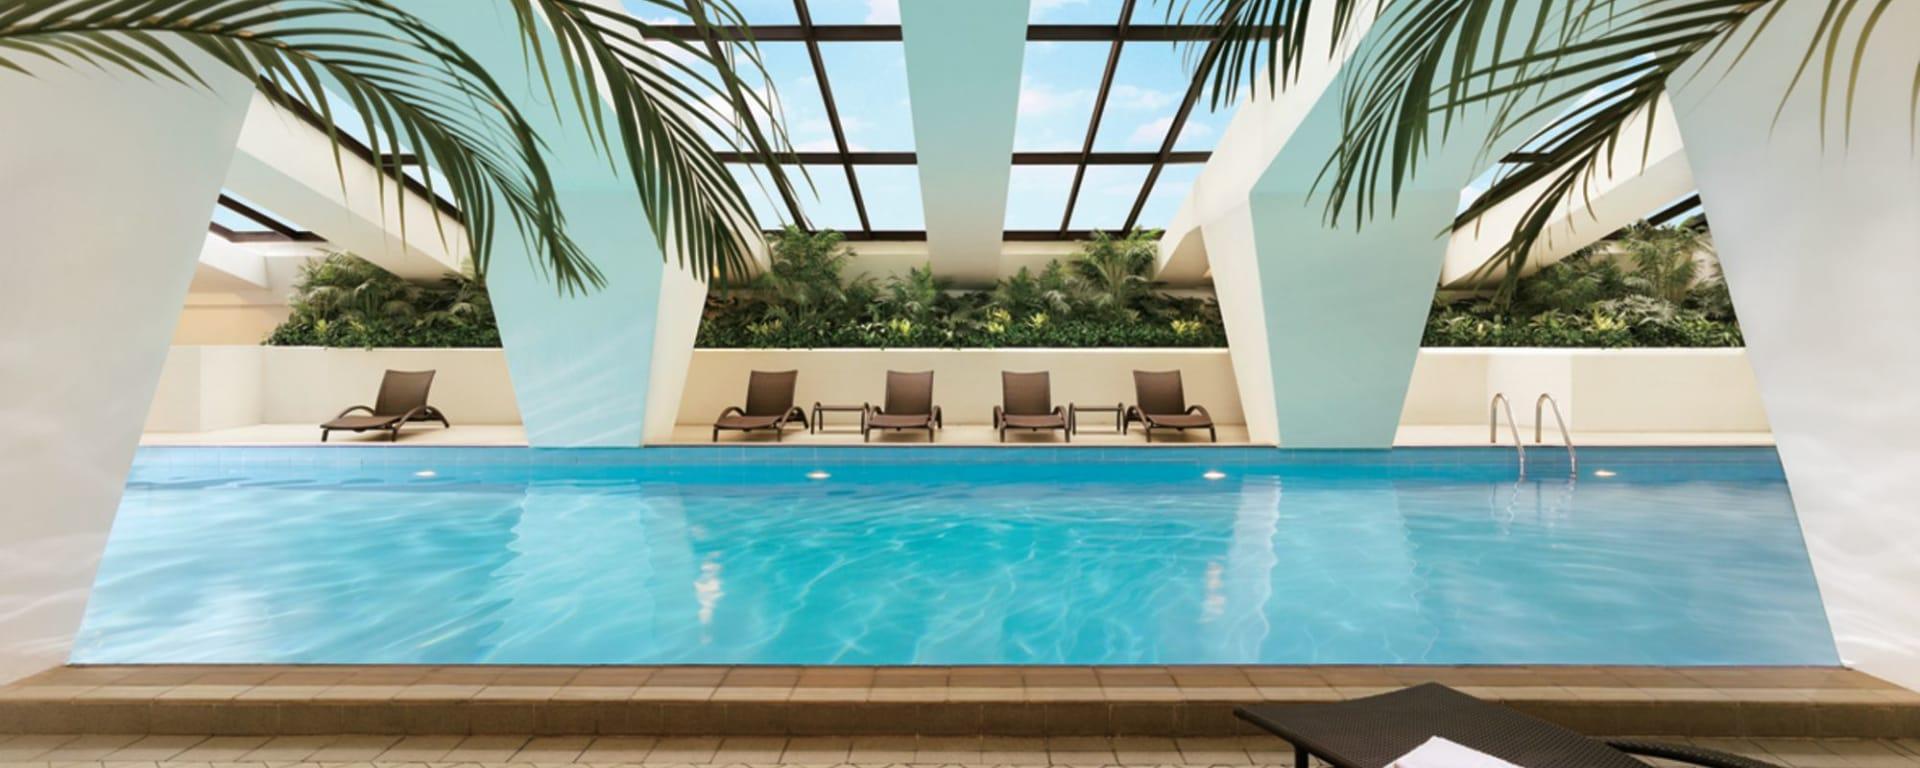 Royal Macau: Swimming Pool Day